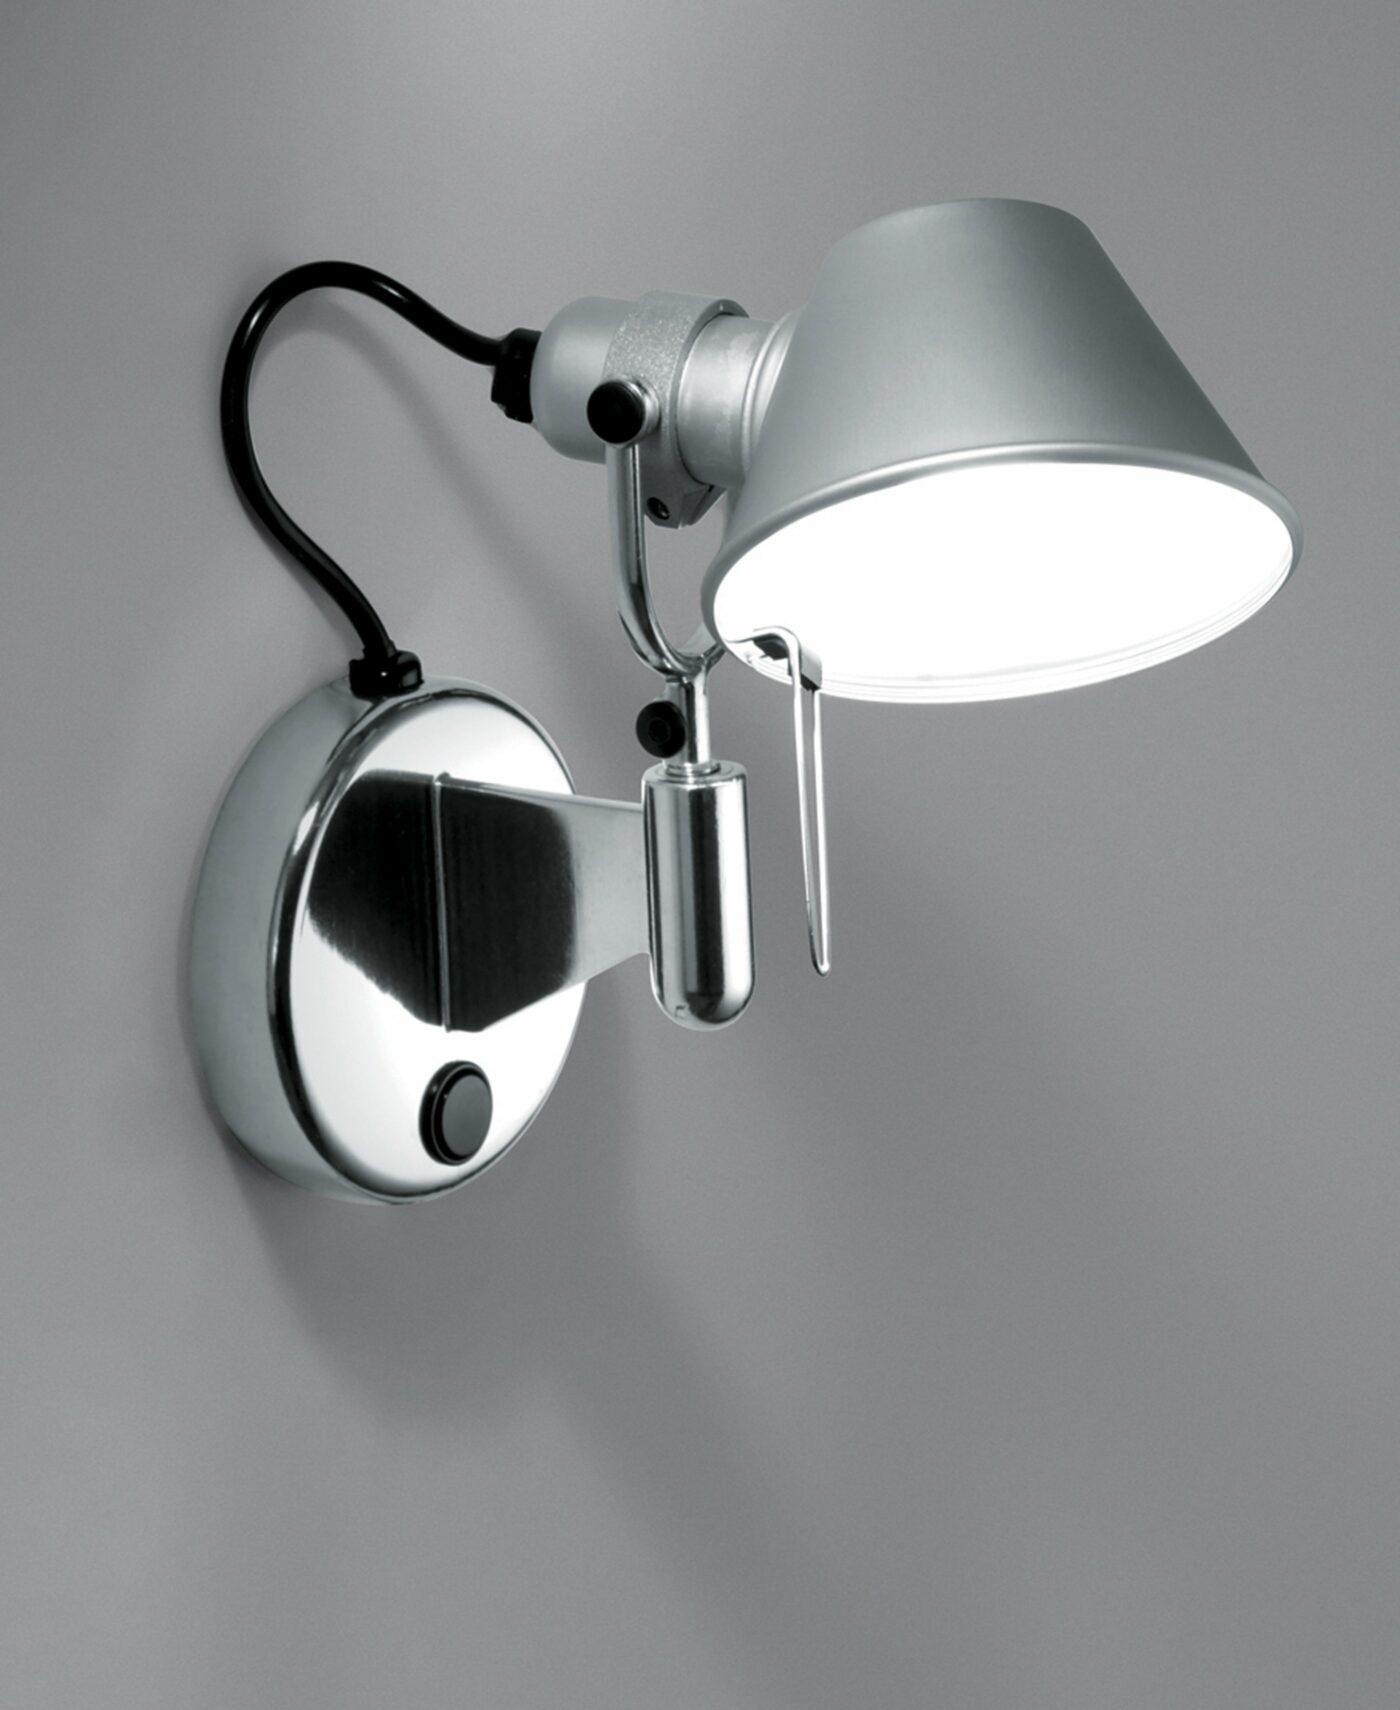 Artemide Tolomeo Micro Faretto LED mit Kippschalter